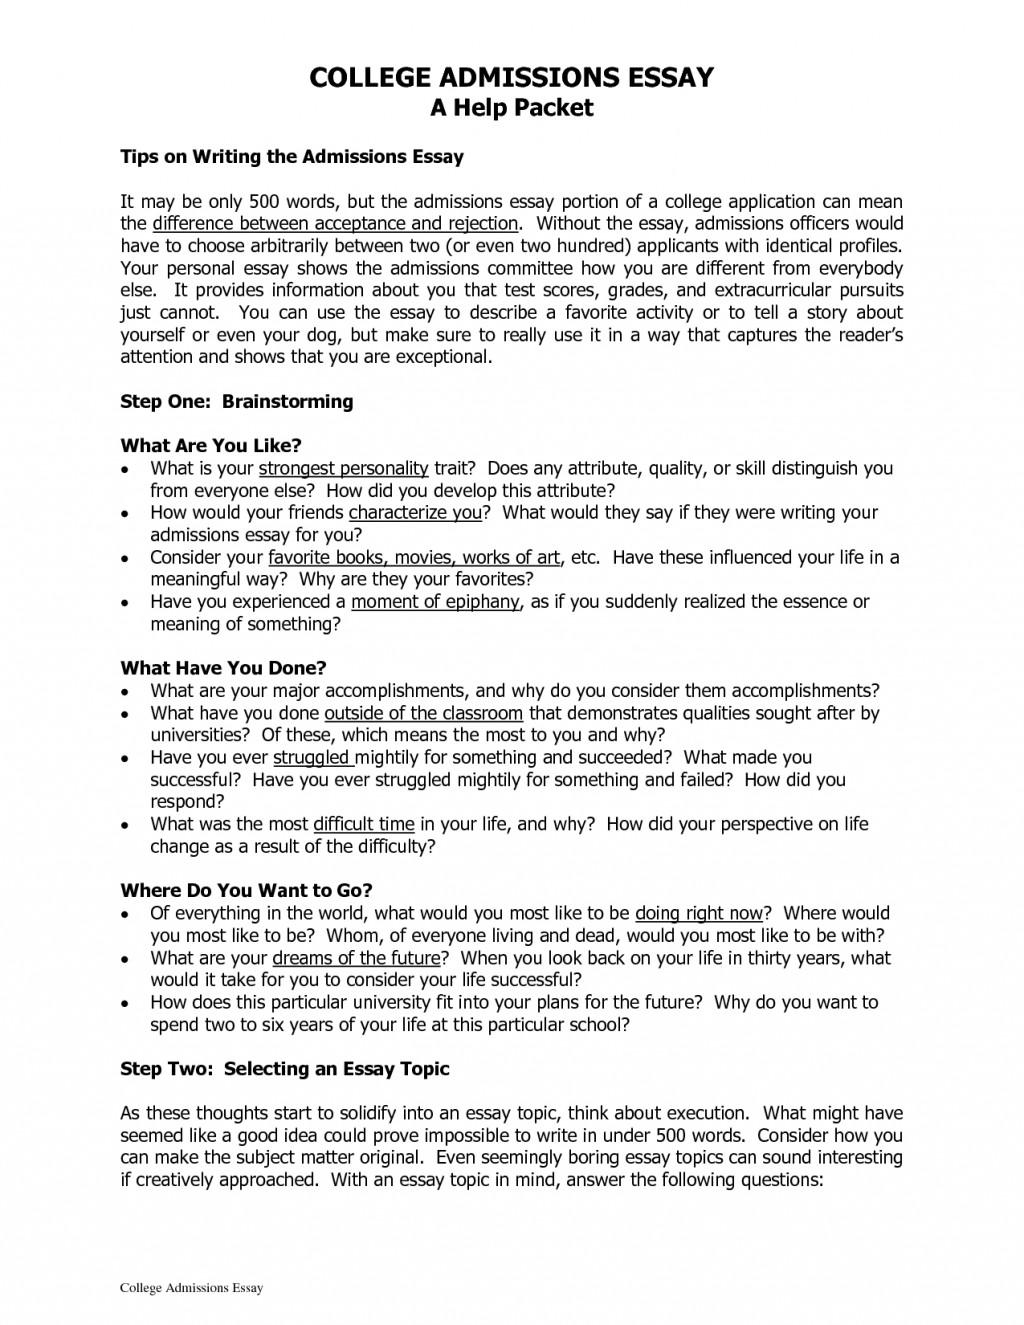 Richard auty resource curse thesis